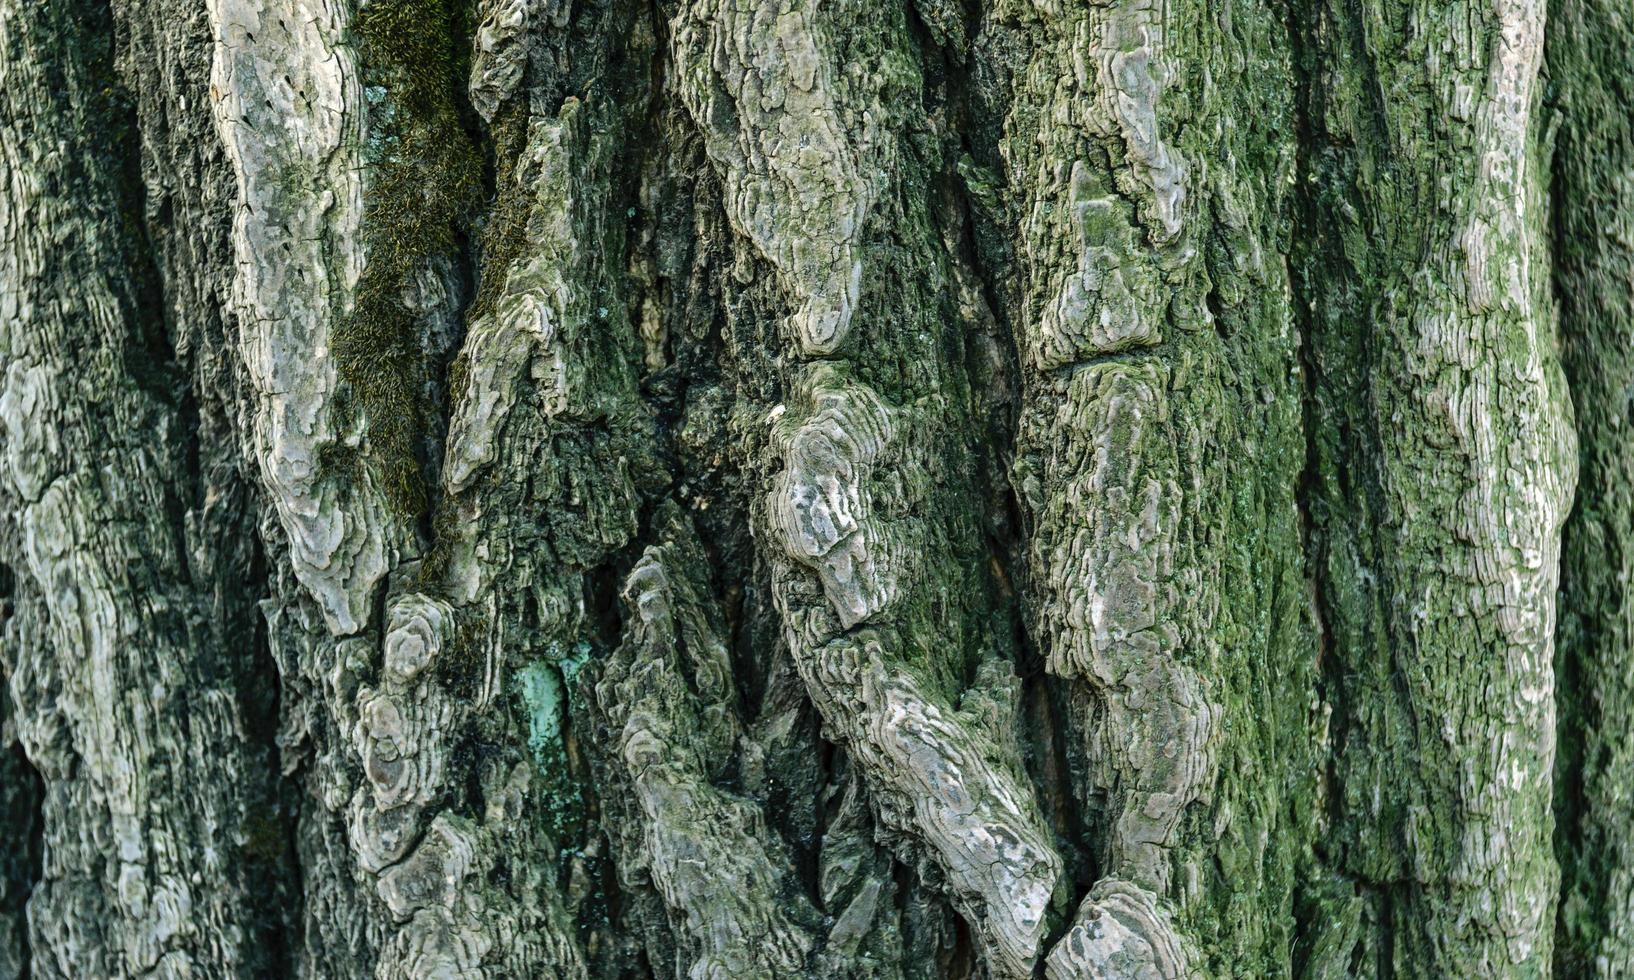 Green moss on tree bark photo